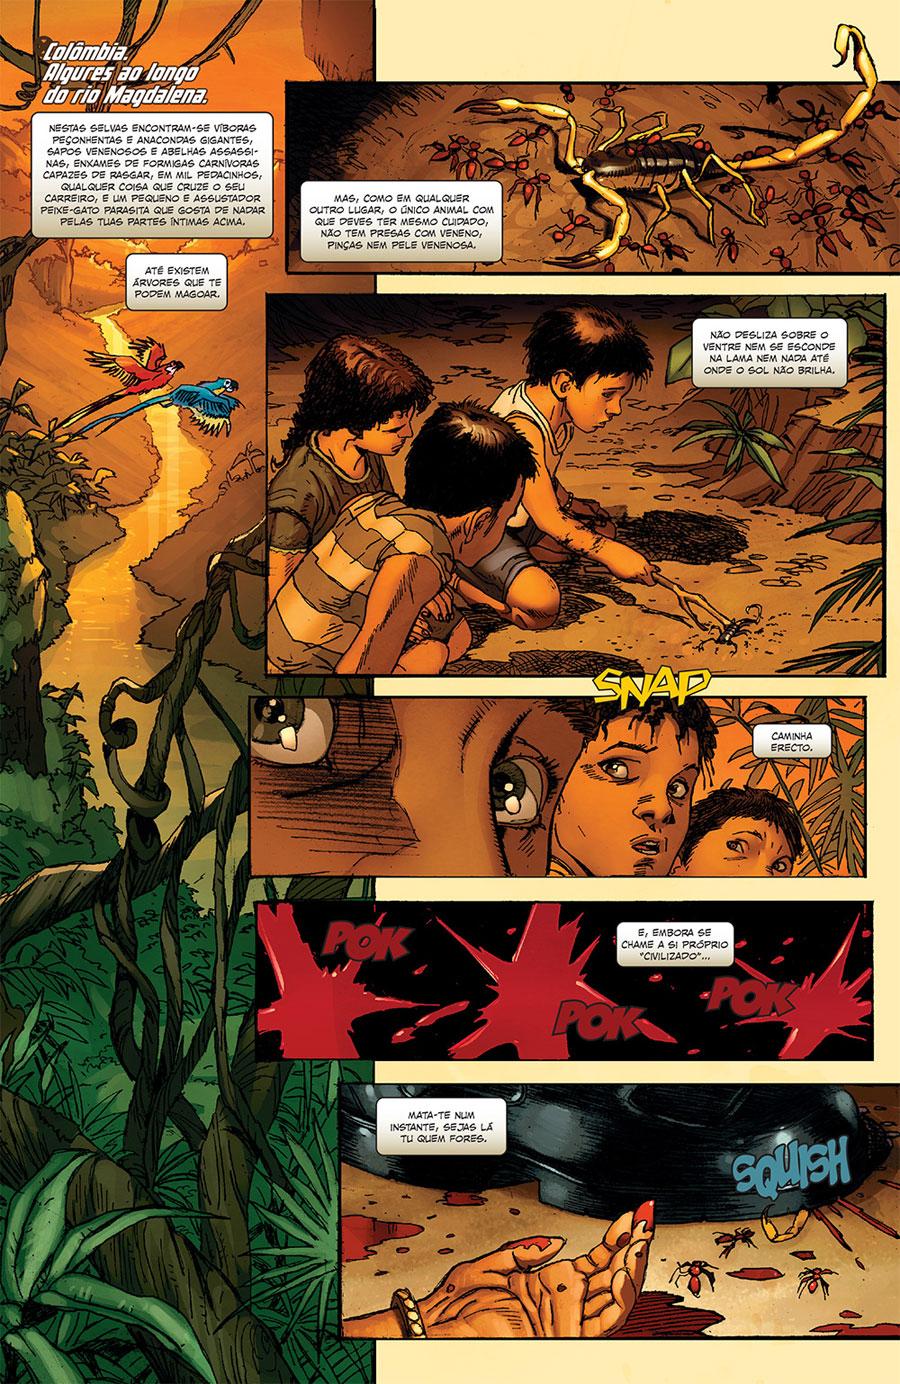 Wolverine, Wolverine Arma X, G. Floy, Deus Me Livro, Os Homens de Adamantium, Jason Aaron, Ron Garney